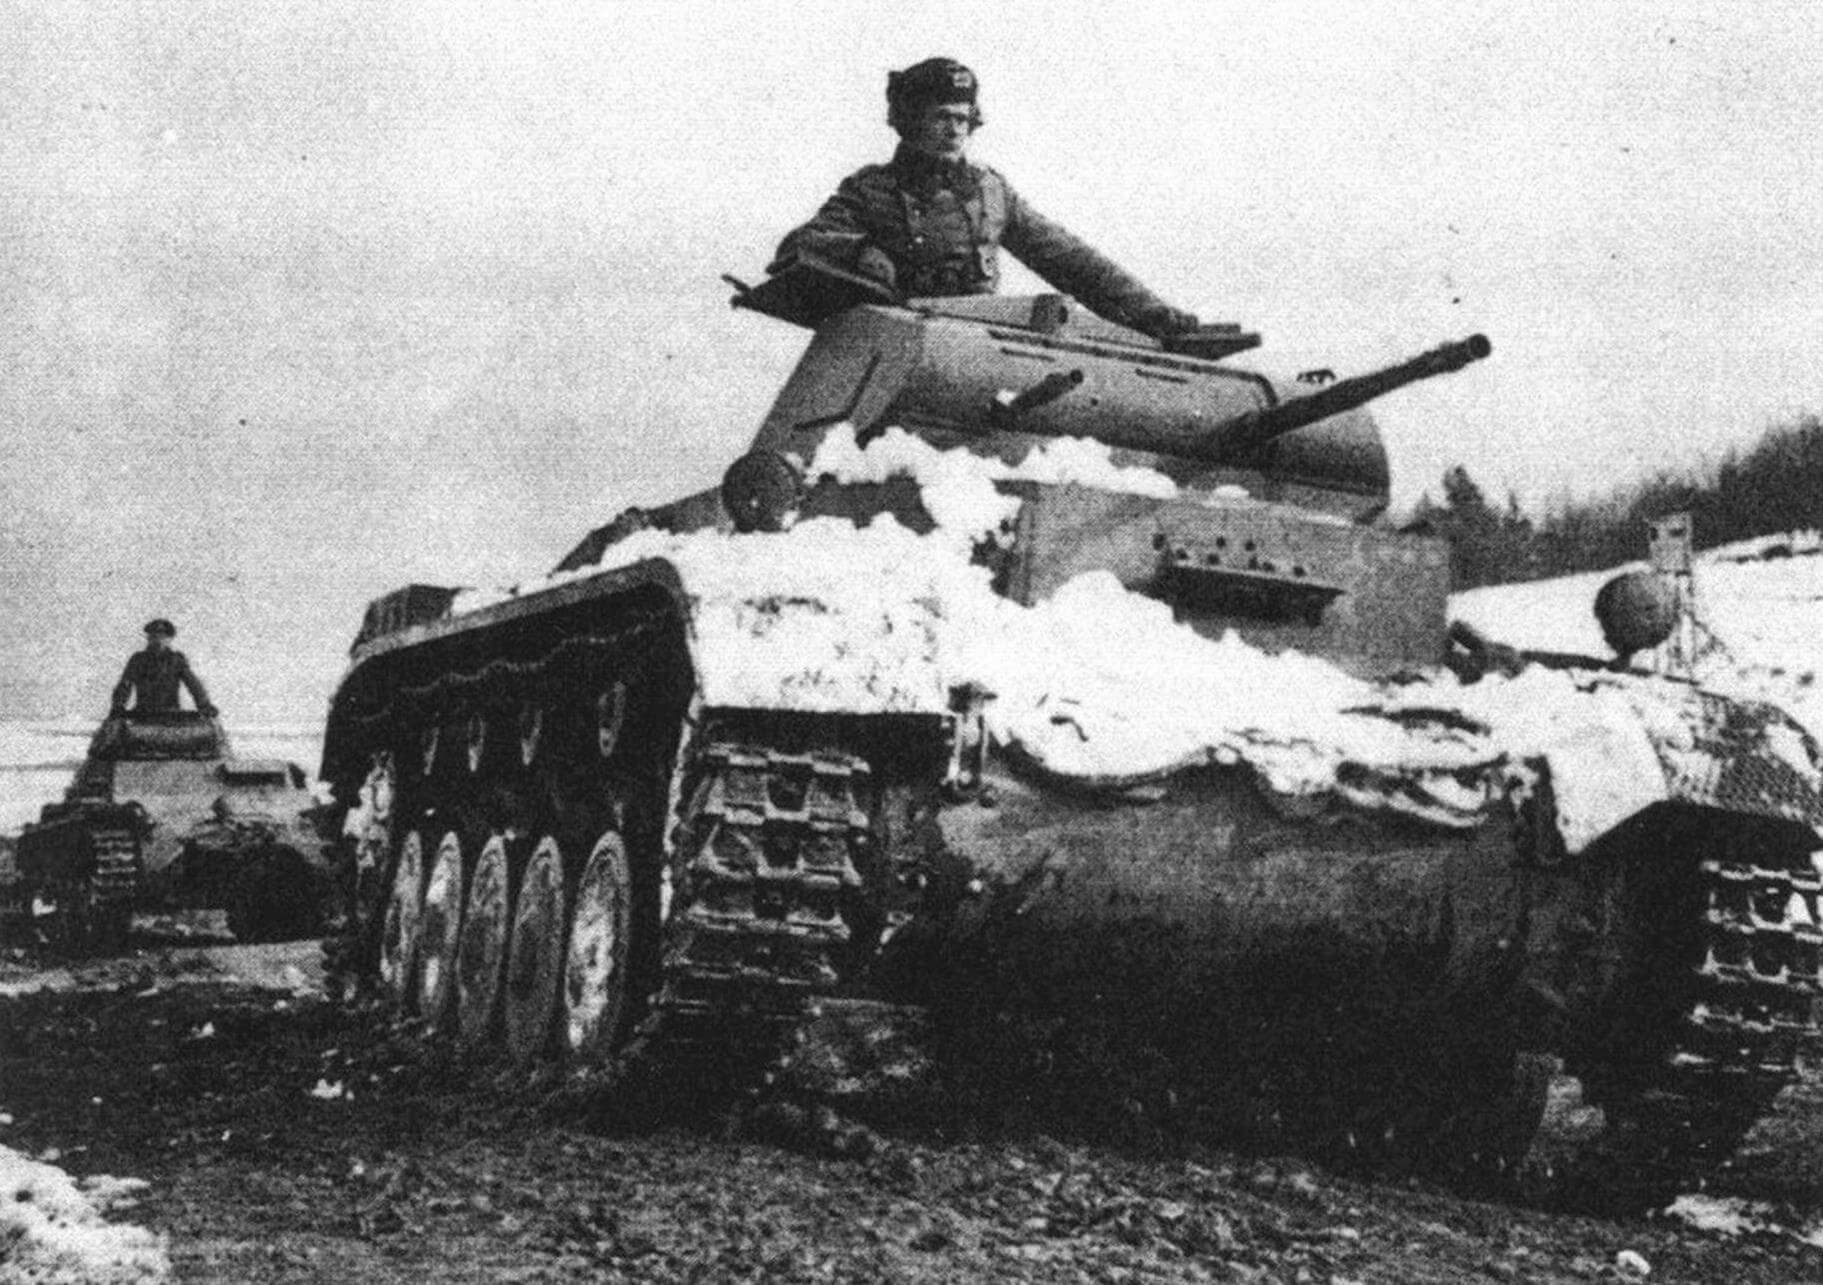 Pz.II Ausf.A на довоенных маневрах Вермахта. 1939 год